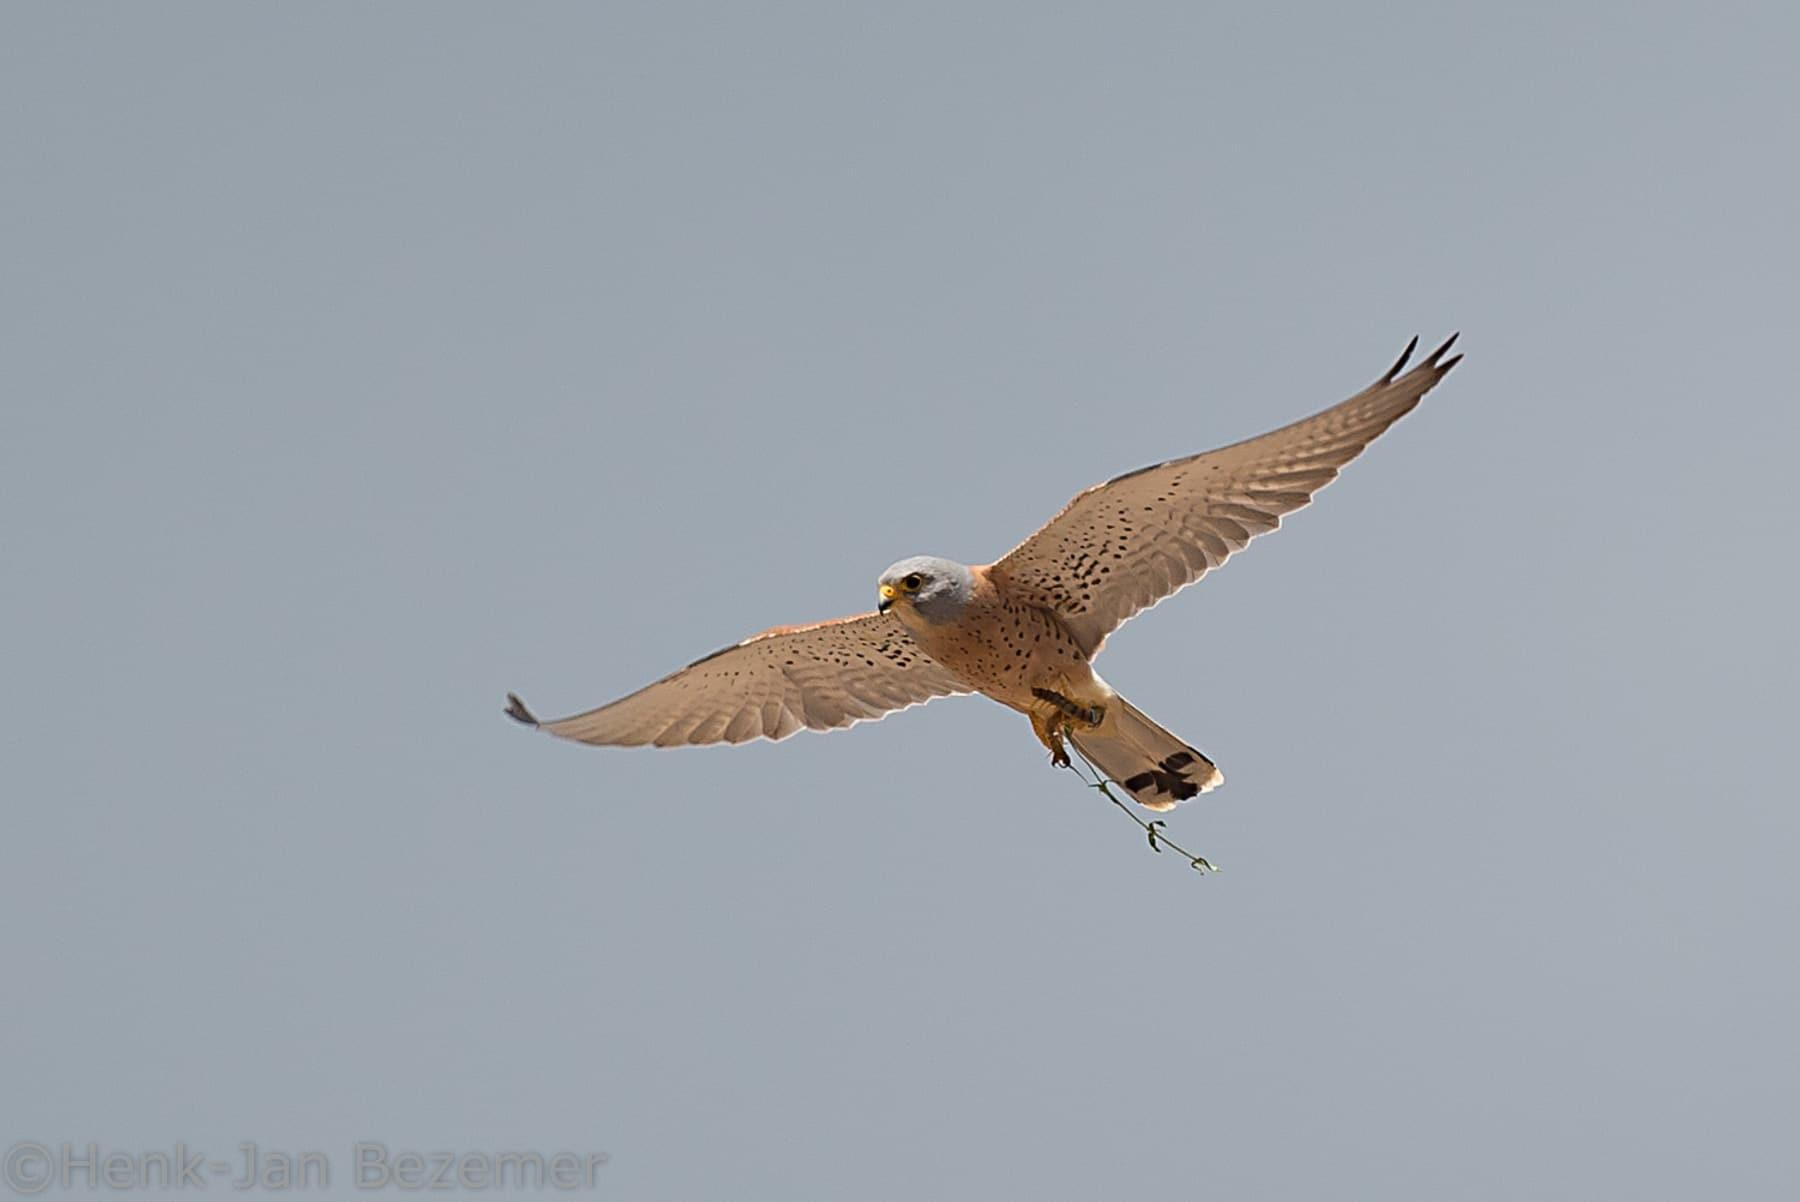 Kleine torenvalk (Falco naumanni)